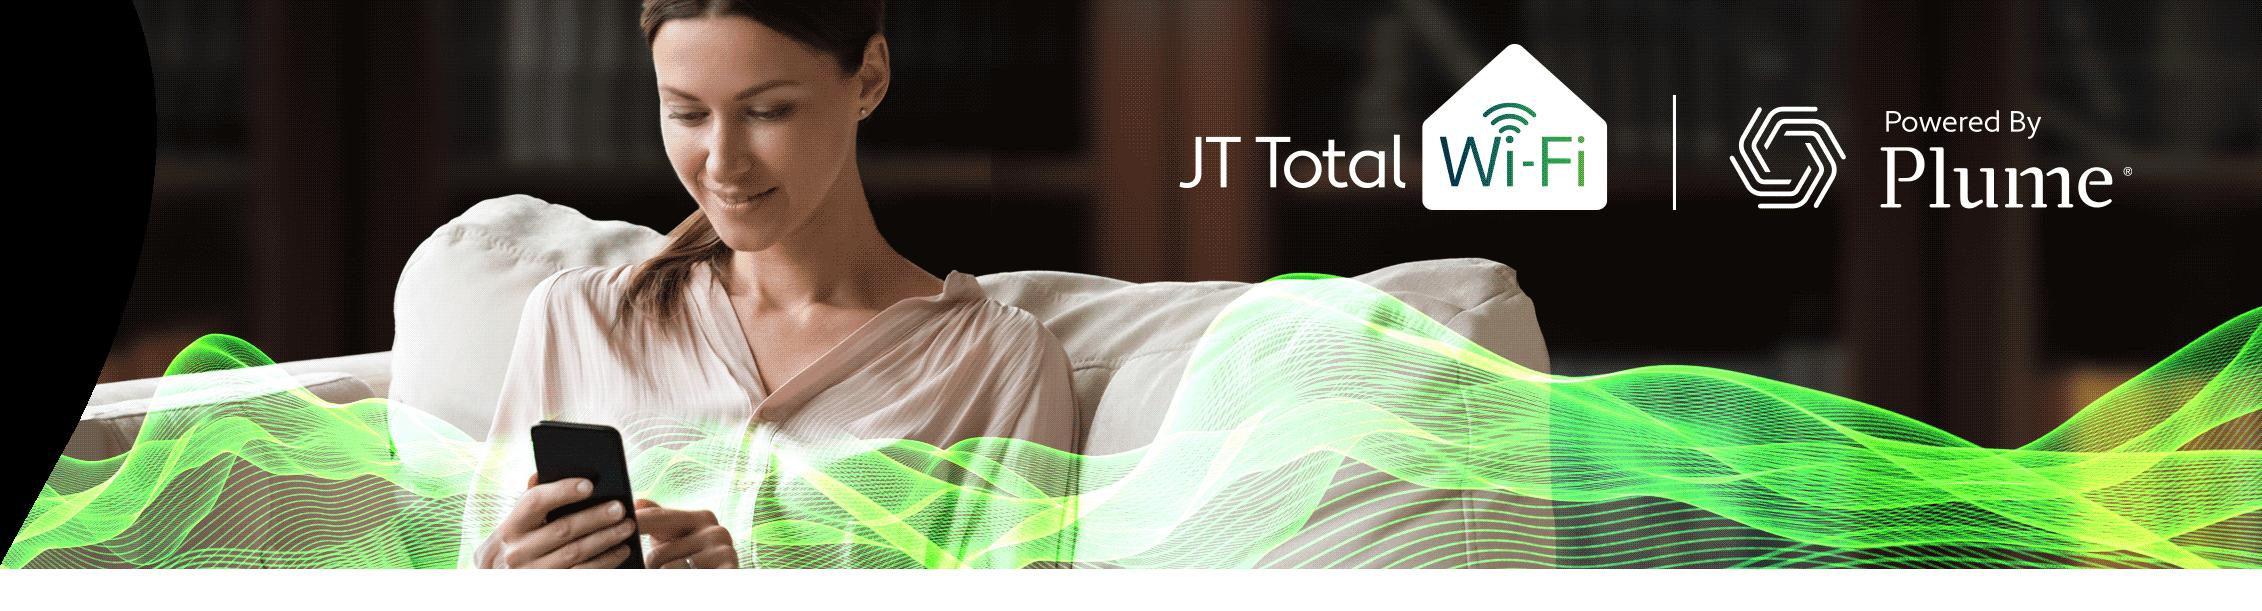 JT Total Wi-Fi by Plume